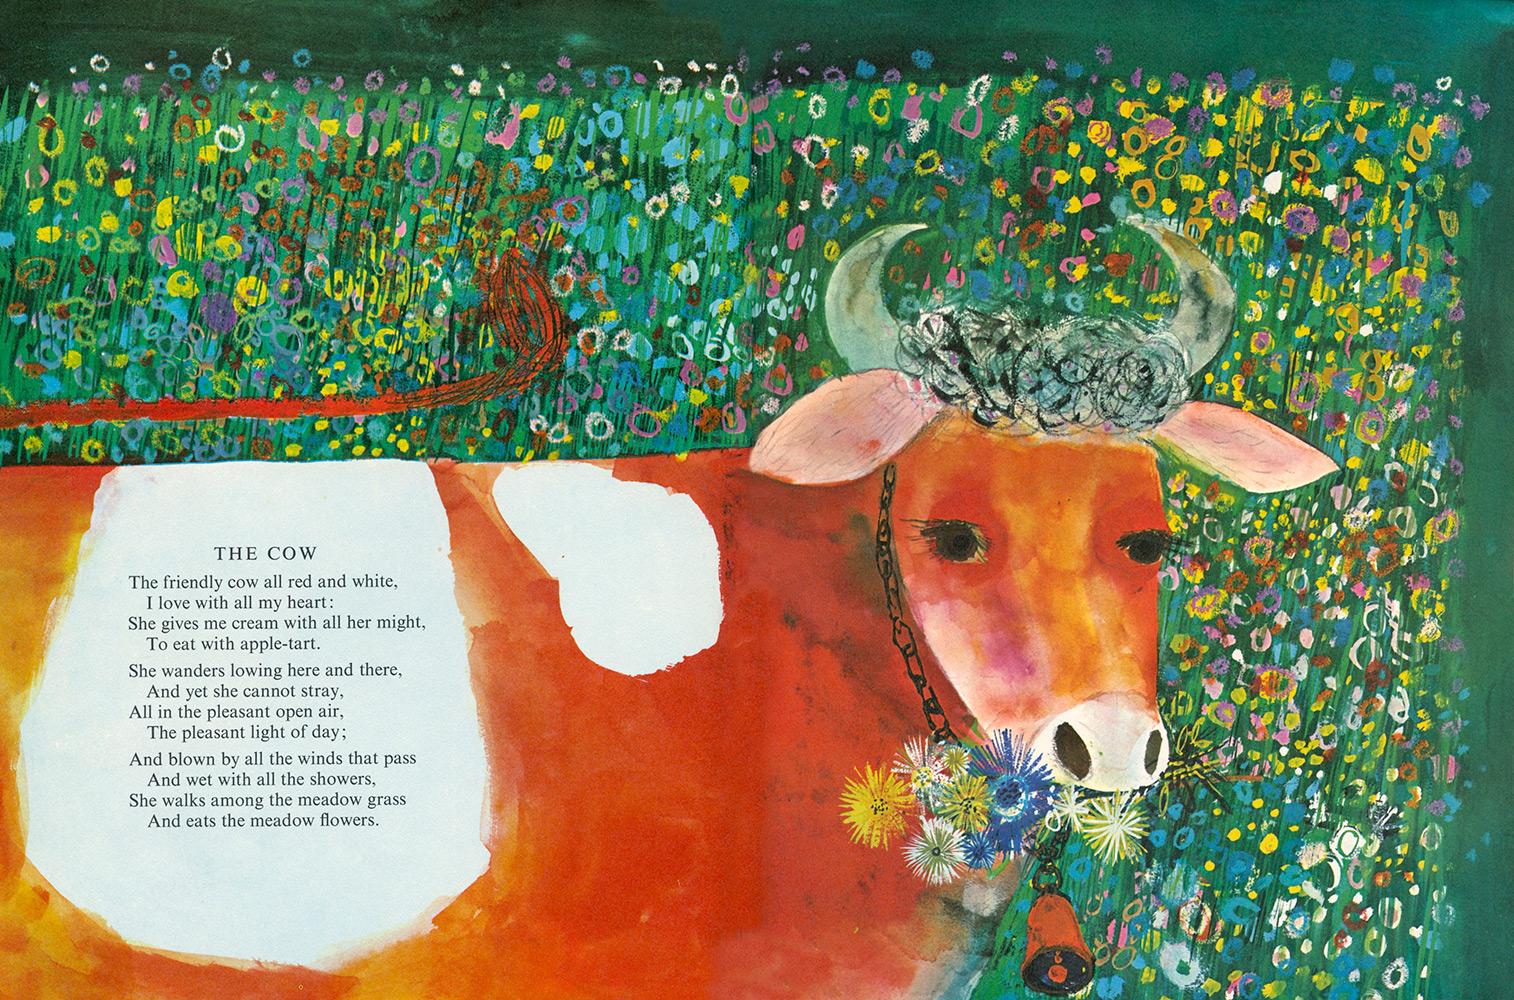 Robert-Louis-Stevenson-a-childs-garden-of-verses-The-Cow-Brian-Wildsmith.jpg